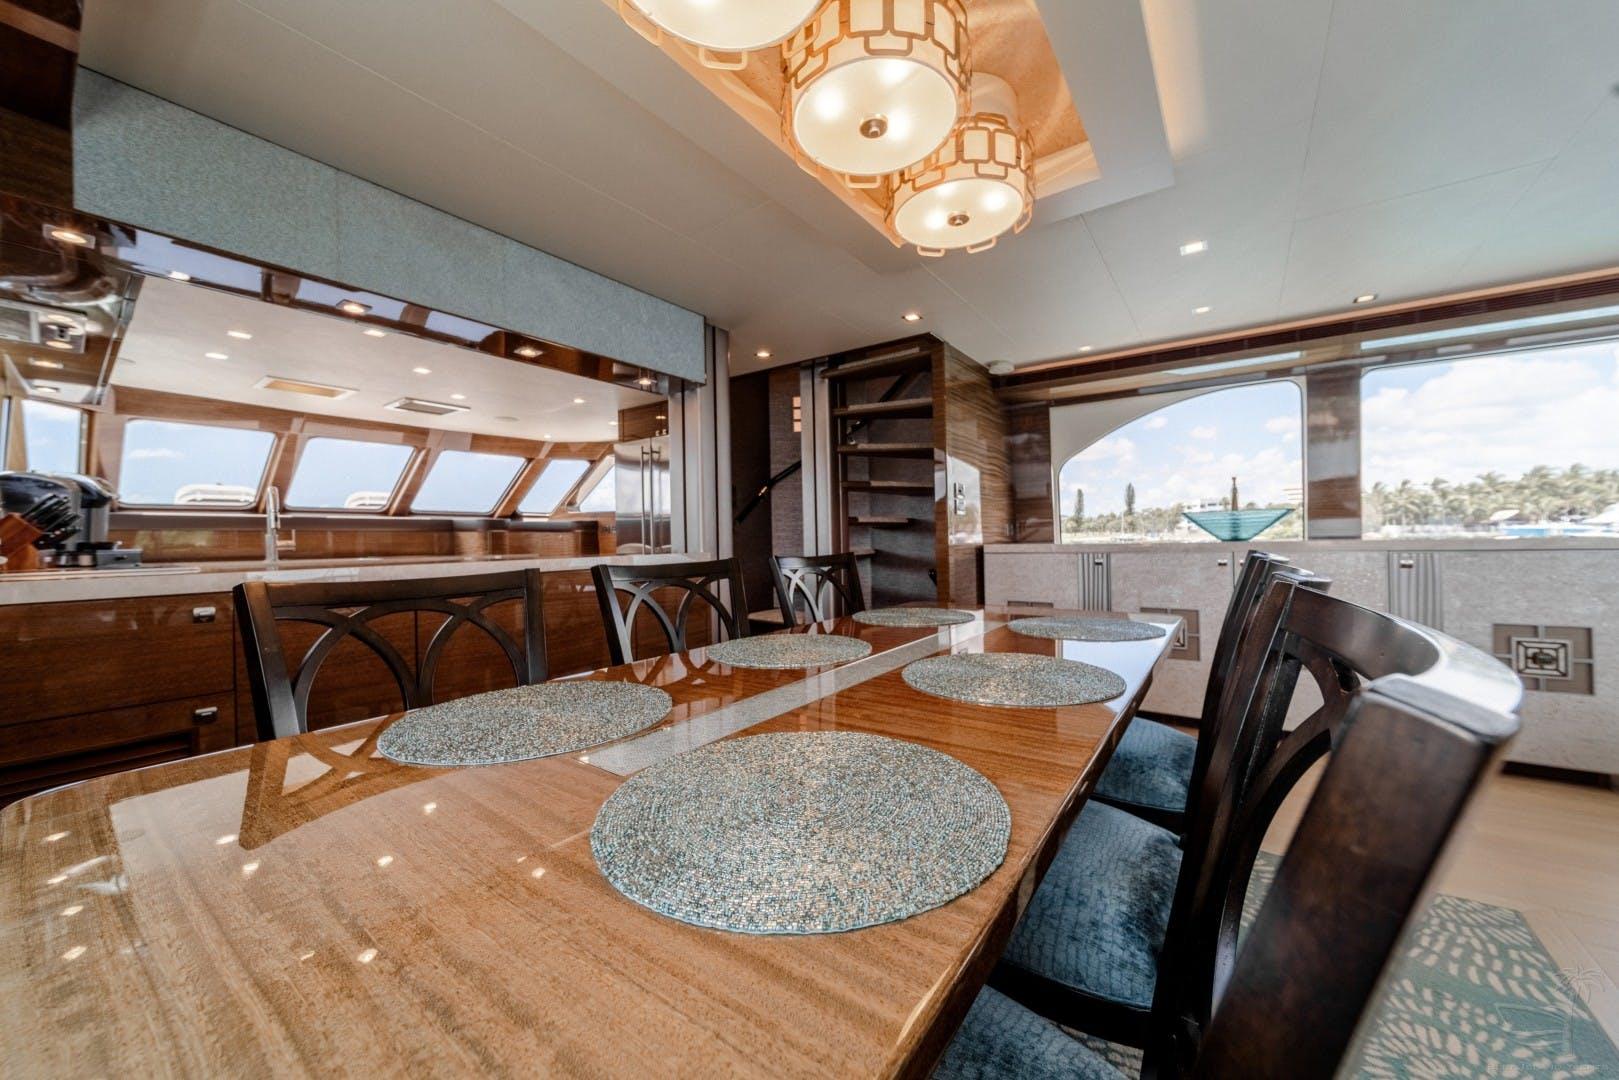 2018 Cheoy Lee 78' 78 Bravo Sport Motor Yacht Deep Blue Zee   Picture 3 of 174